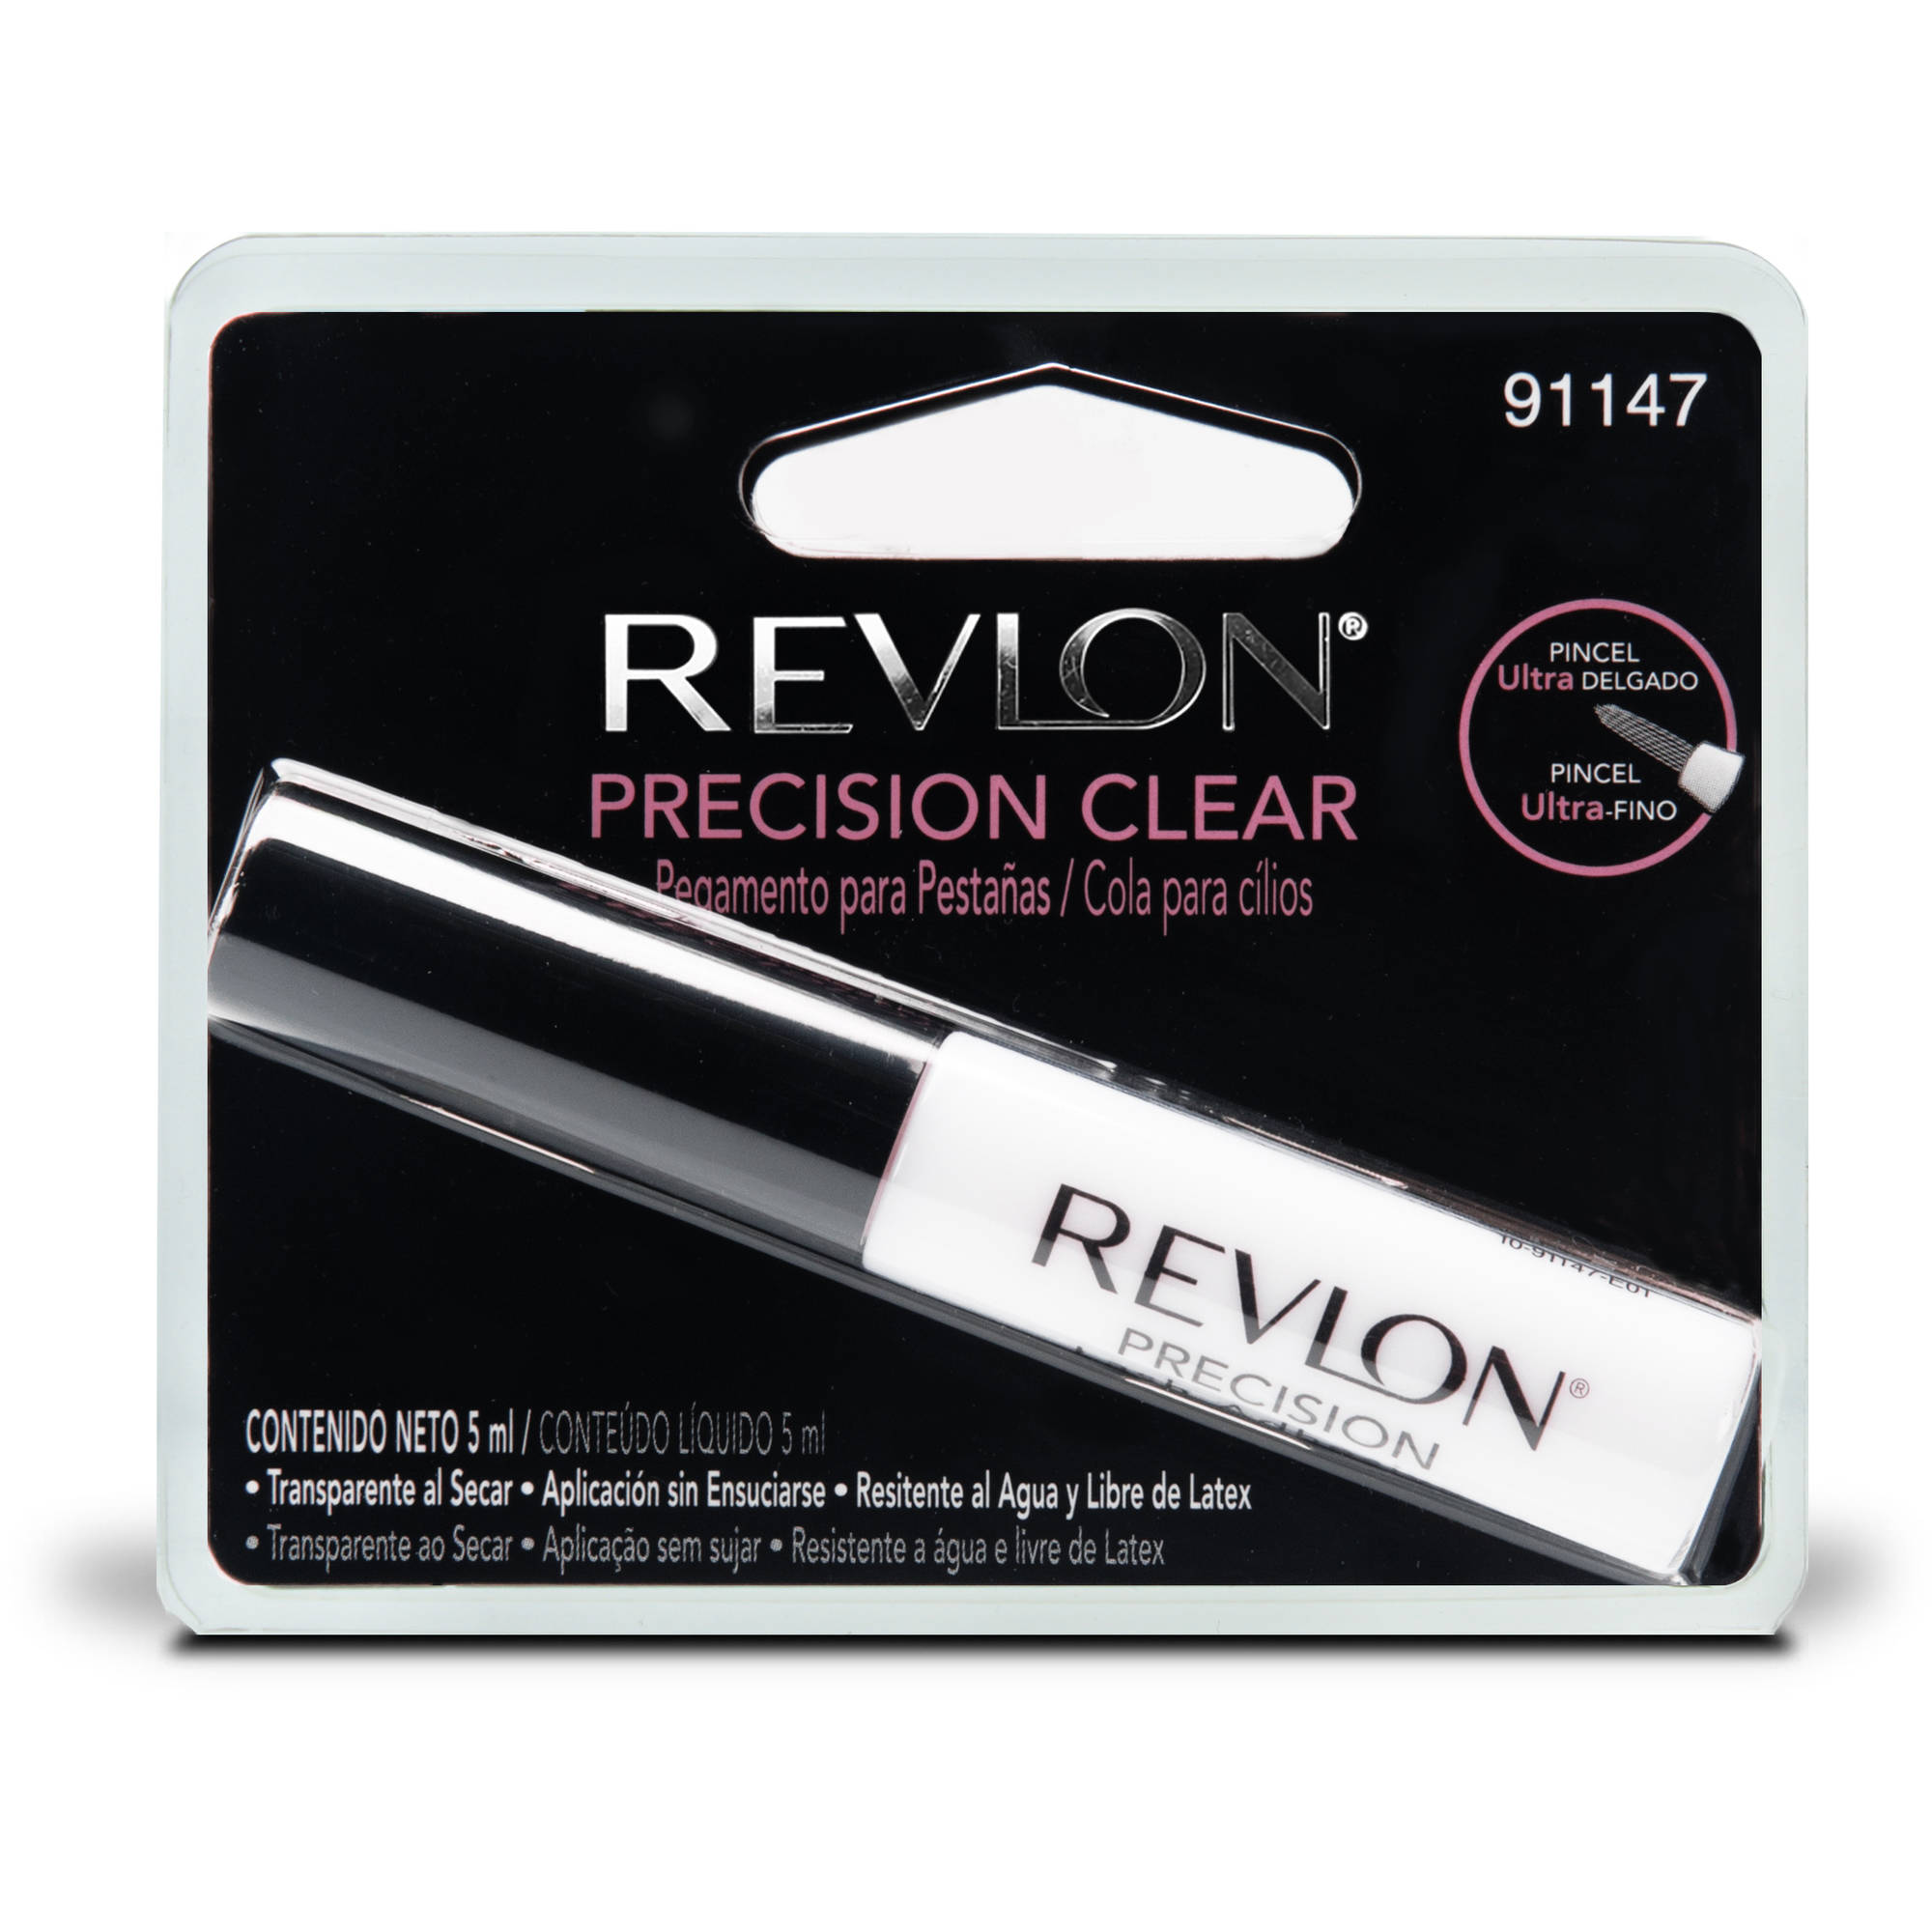 Pacific World Revlon Precision Lash Adhesive 017 Oz Mascara Eyeliner Waterproof